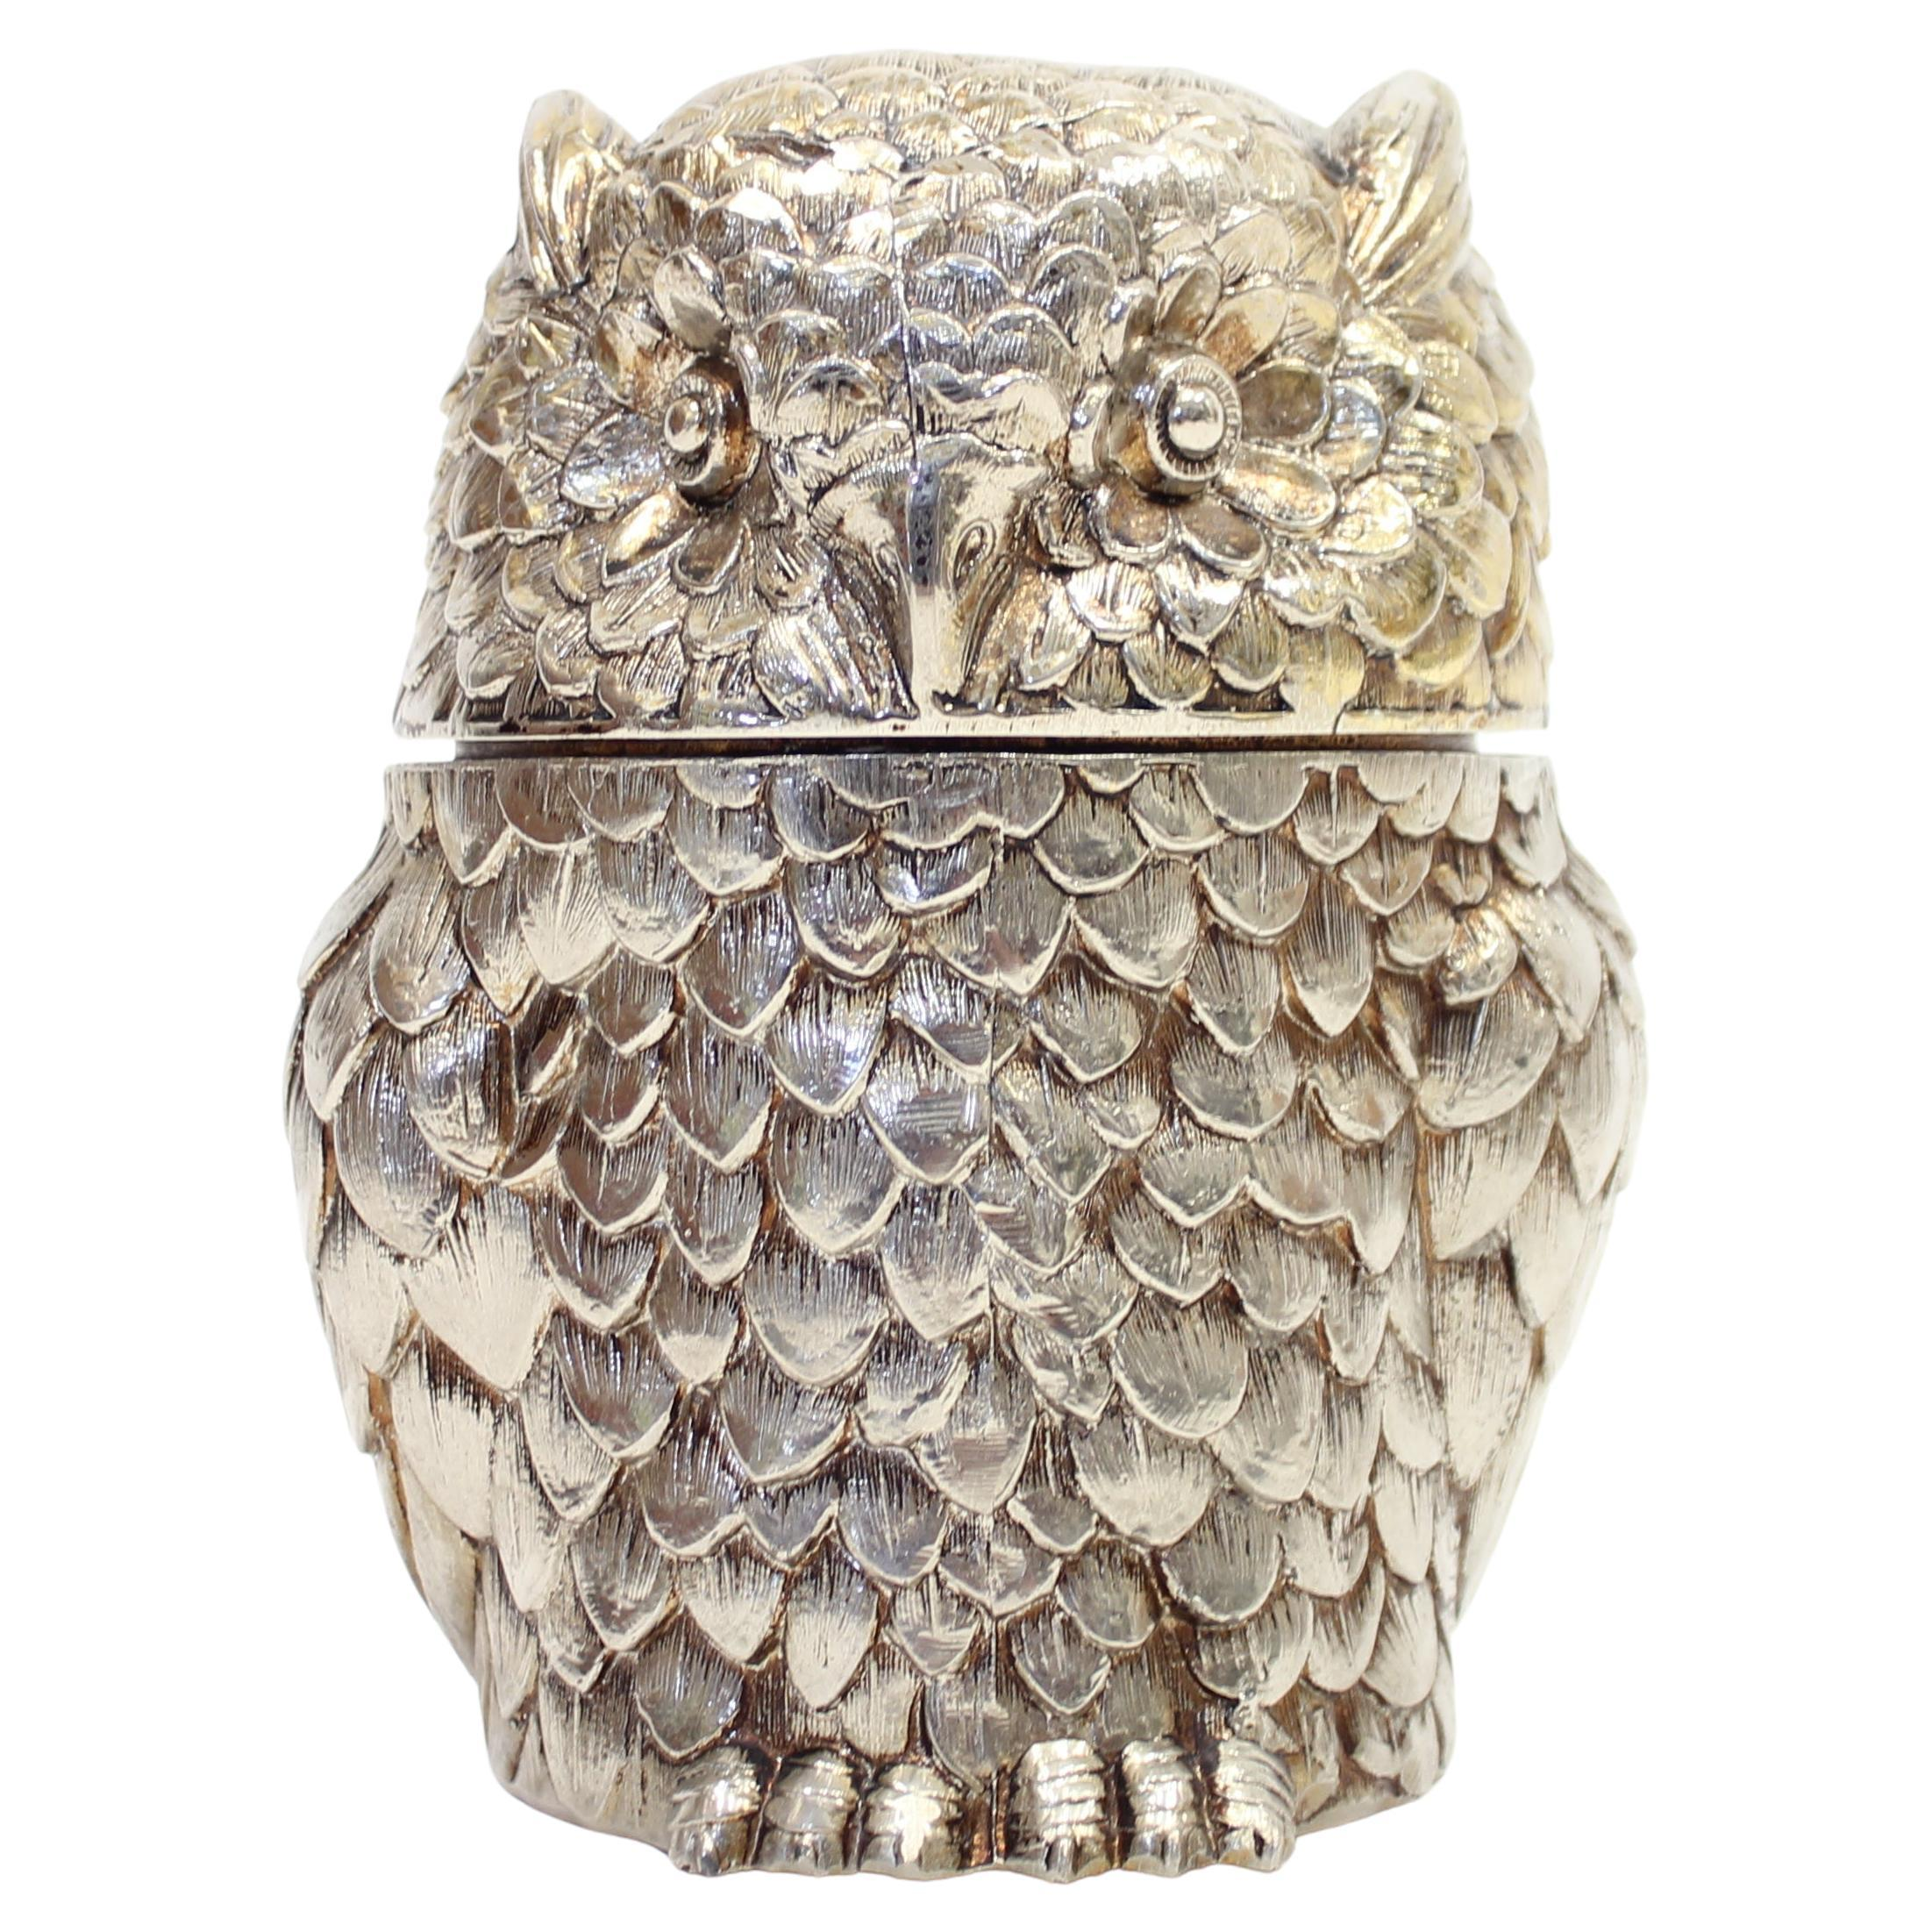 Mauro Manetti, Owl Ice Bucket, 1970s